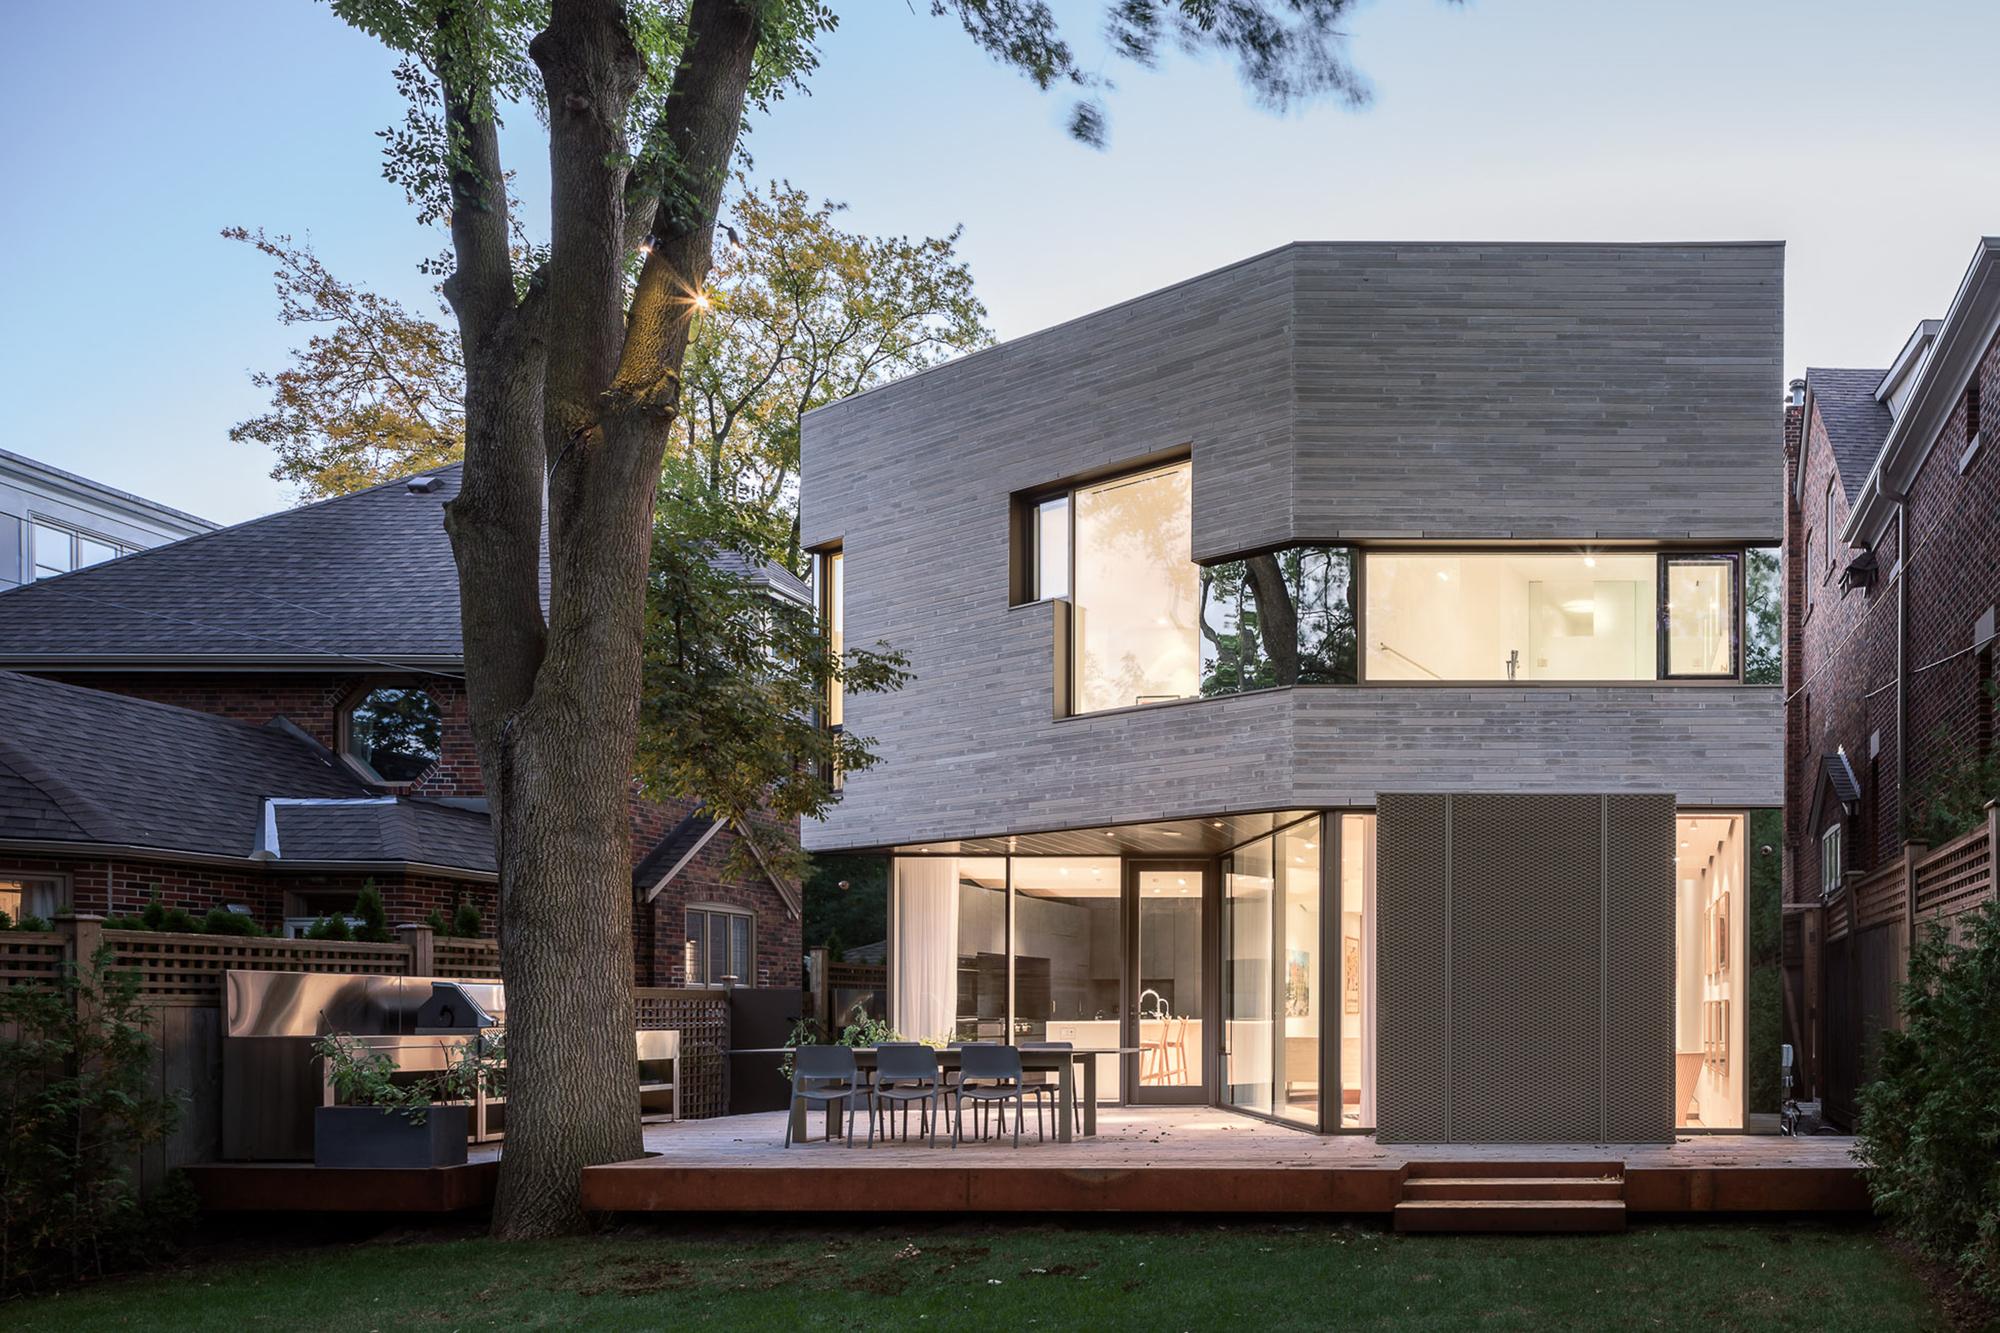 Rosemary House Kohn Shnier Architects Archdaily